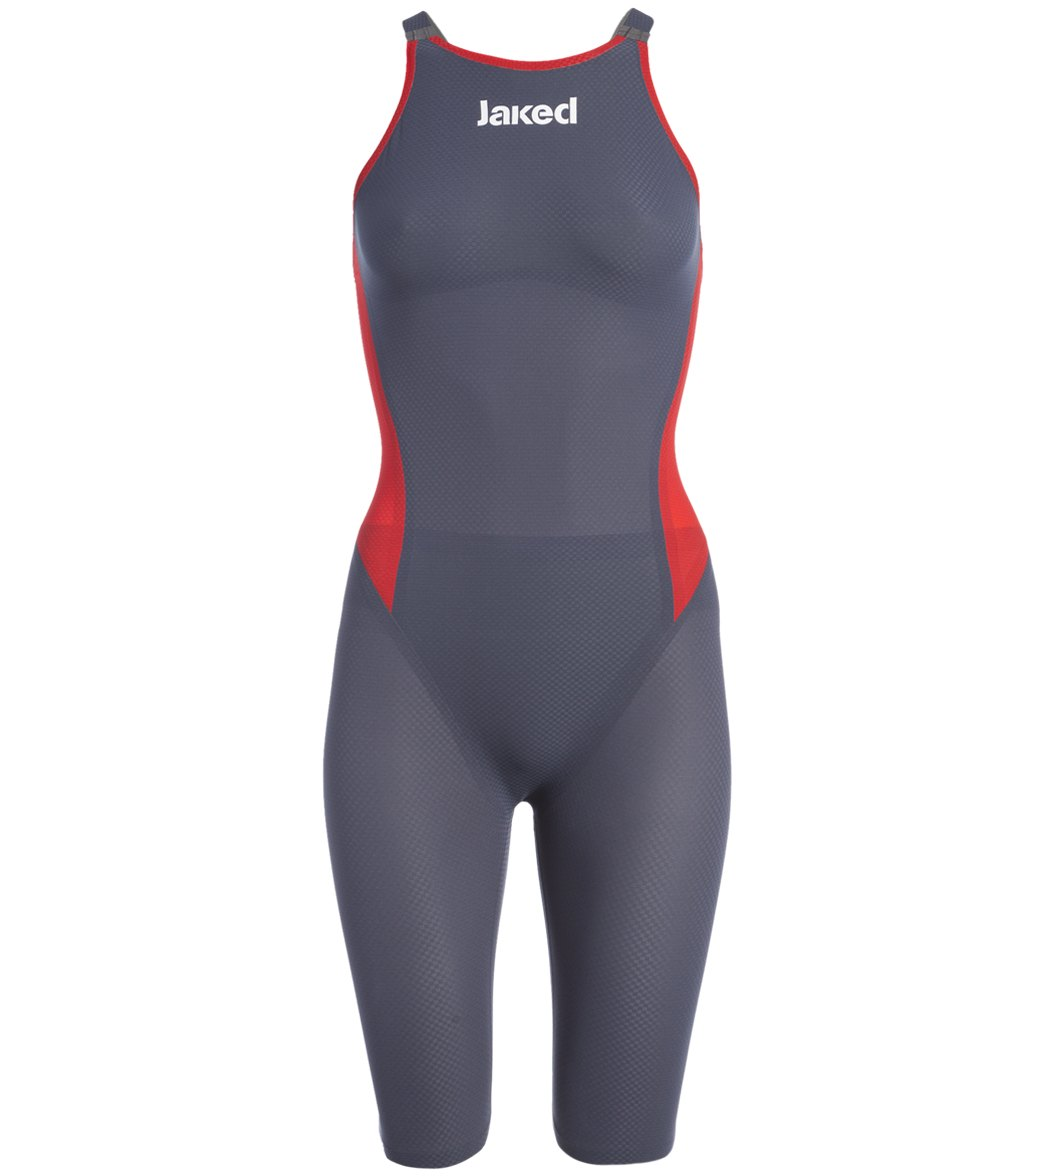 Jaked JRush women's tech suit